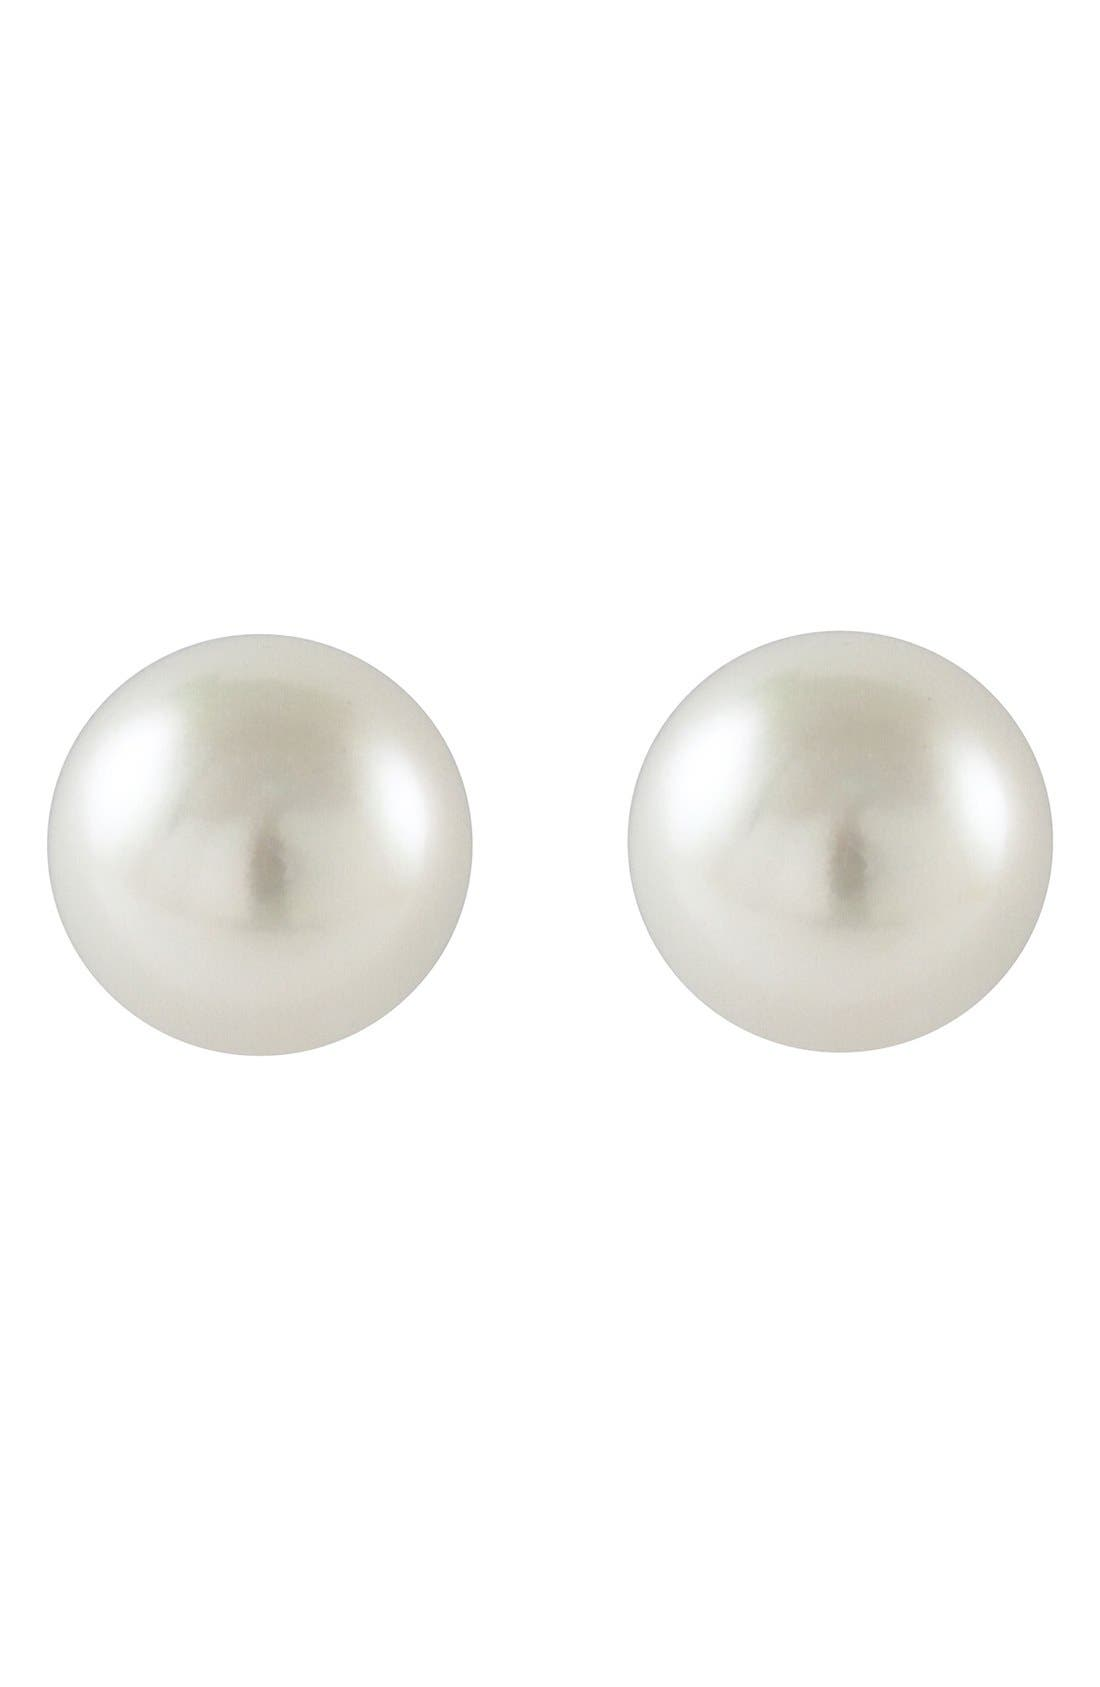 'Luna' 8mm Pearl Stud Earrings,                             Alternate thumbnail 2, color,                             SILVER